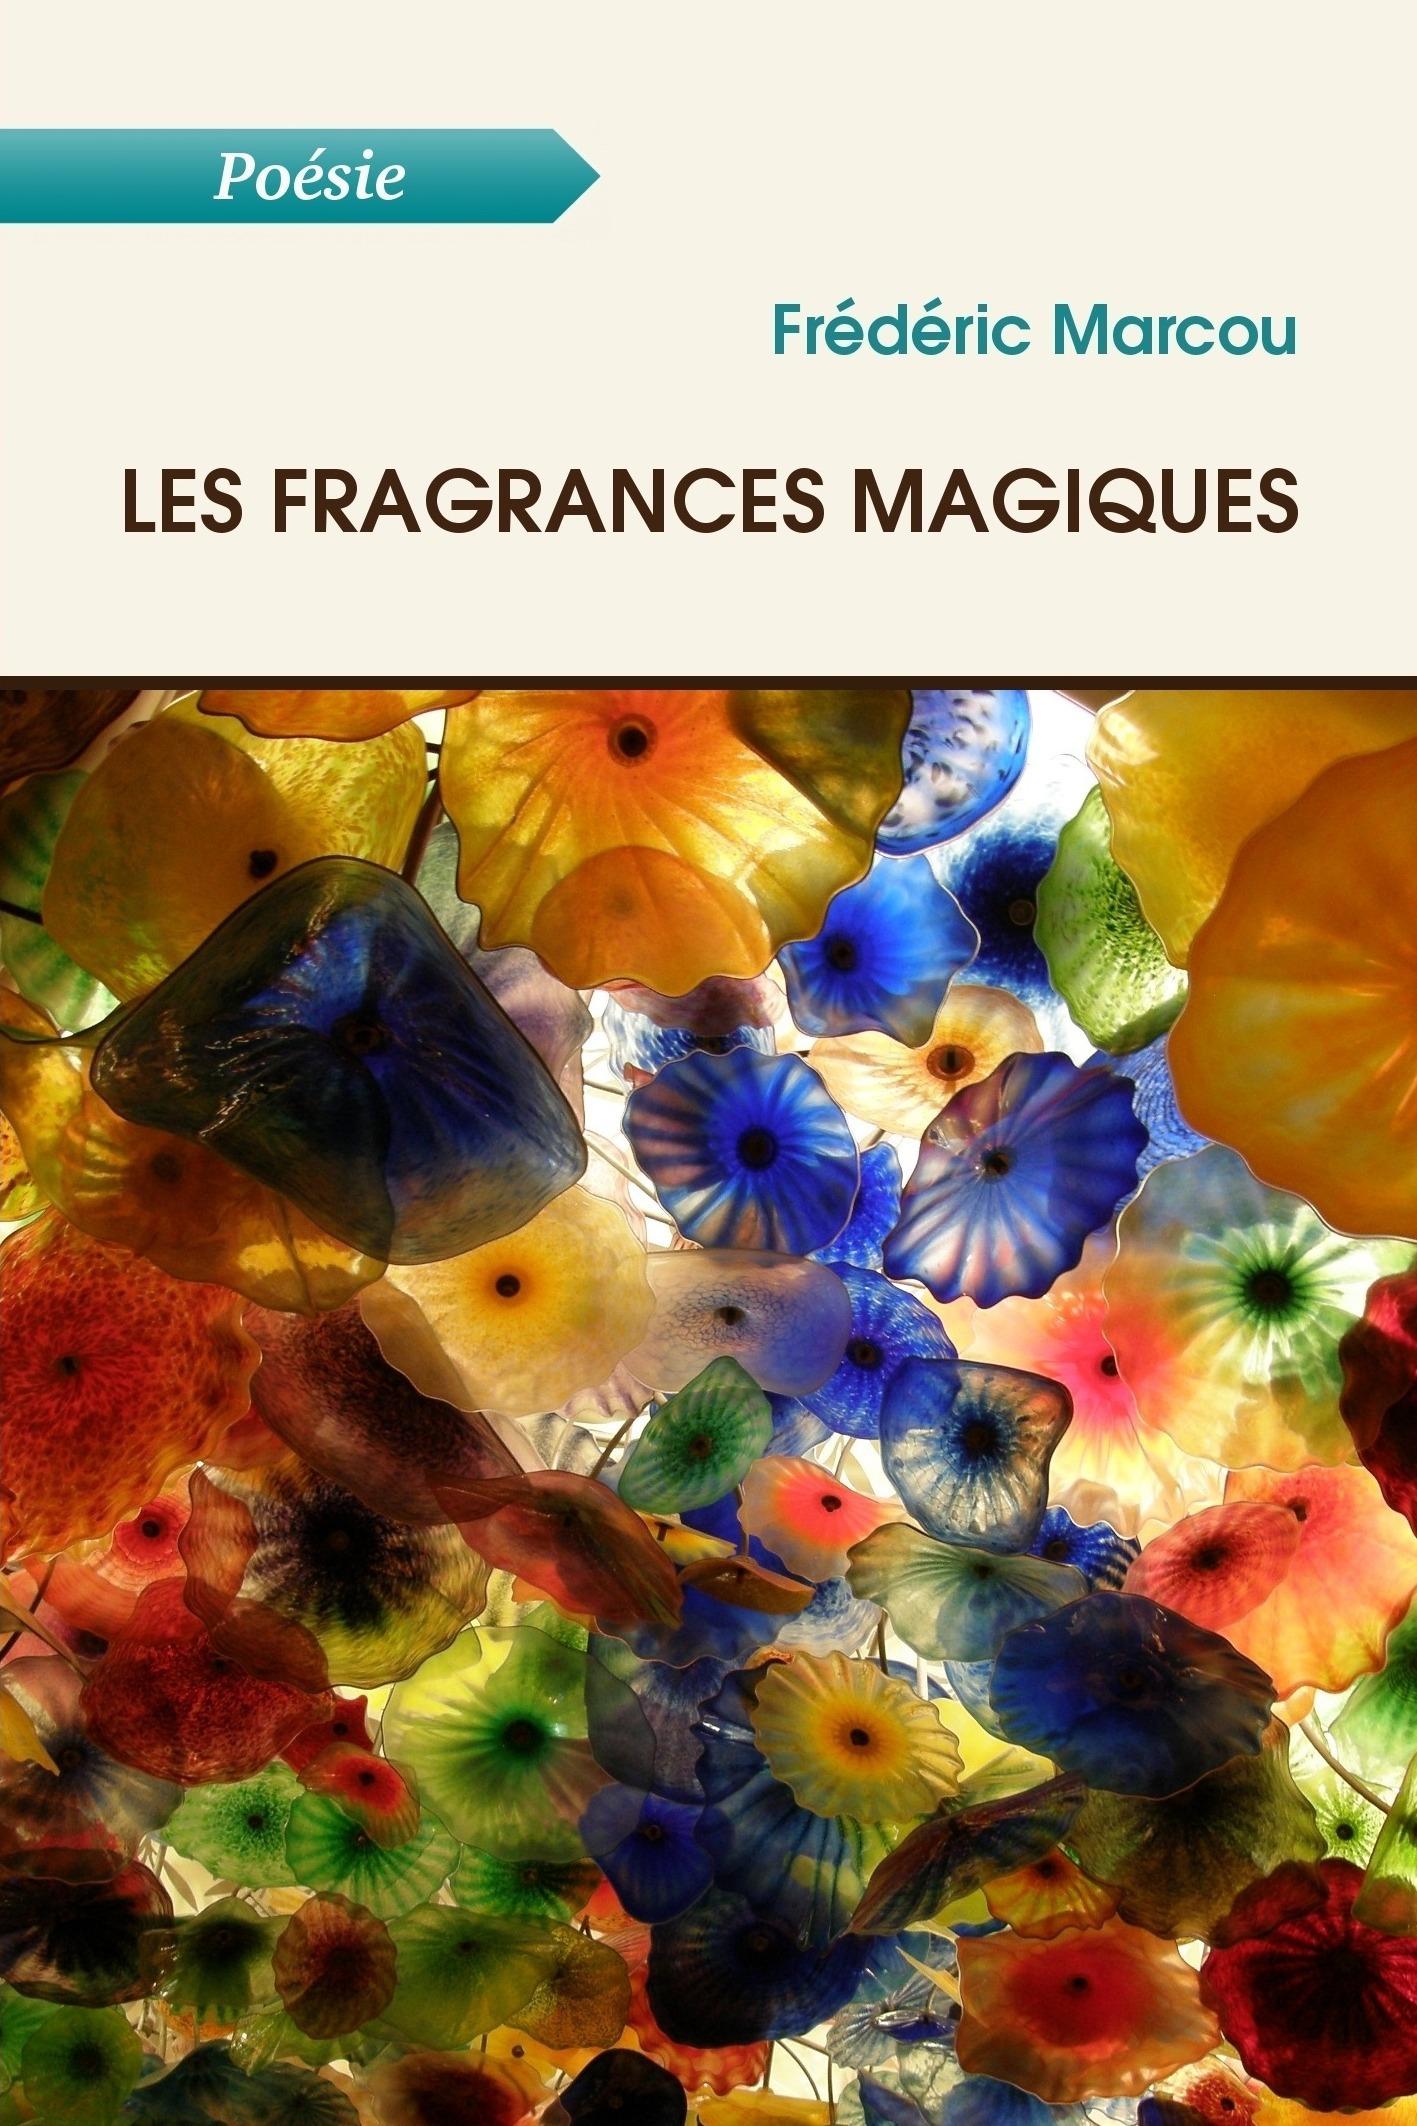 Les fragrances magiques